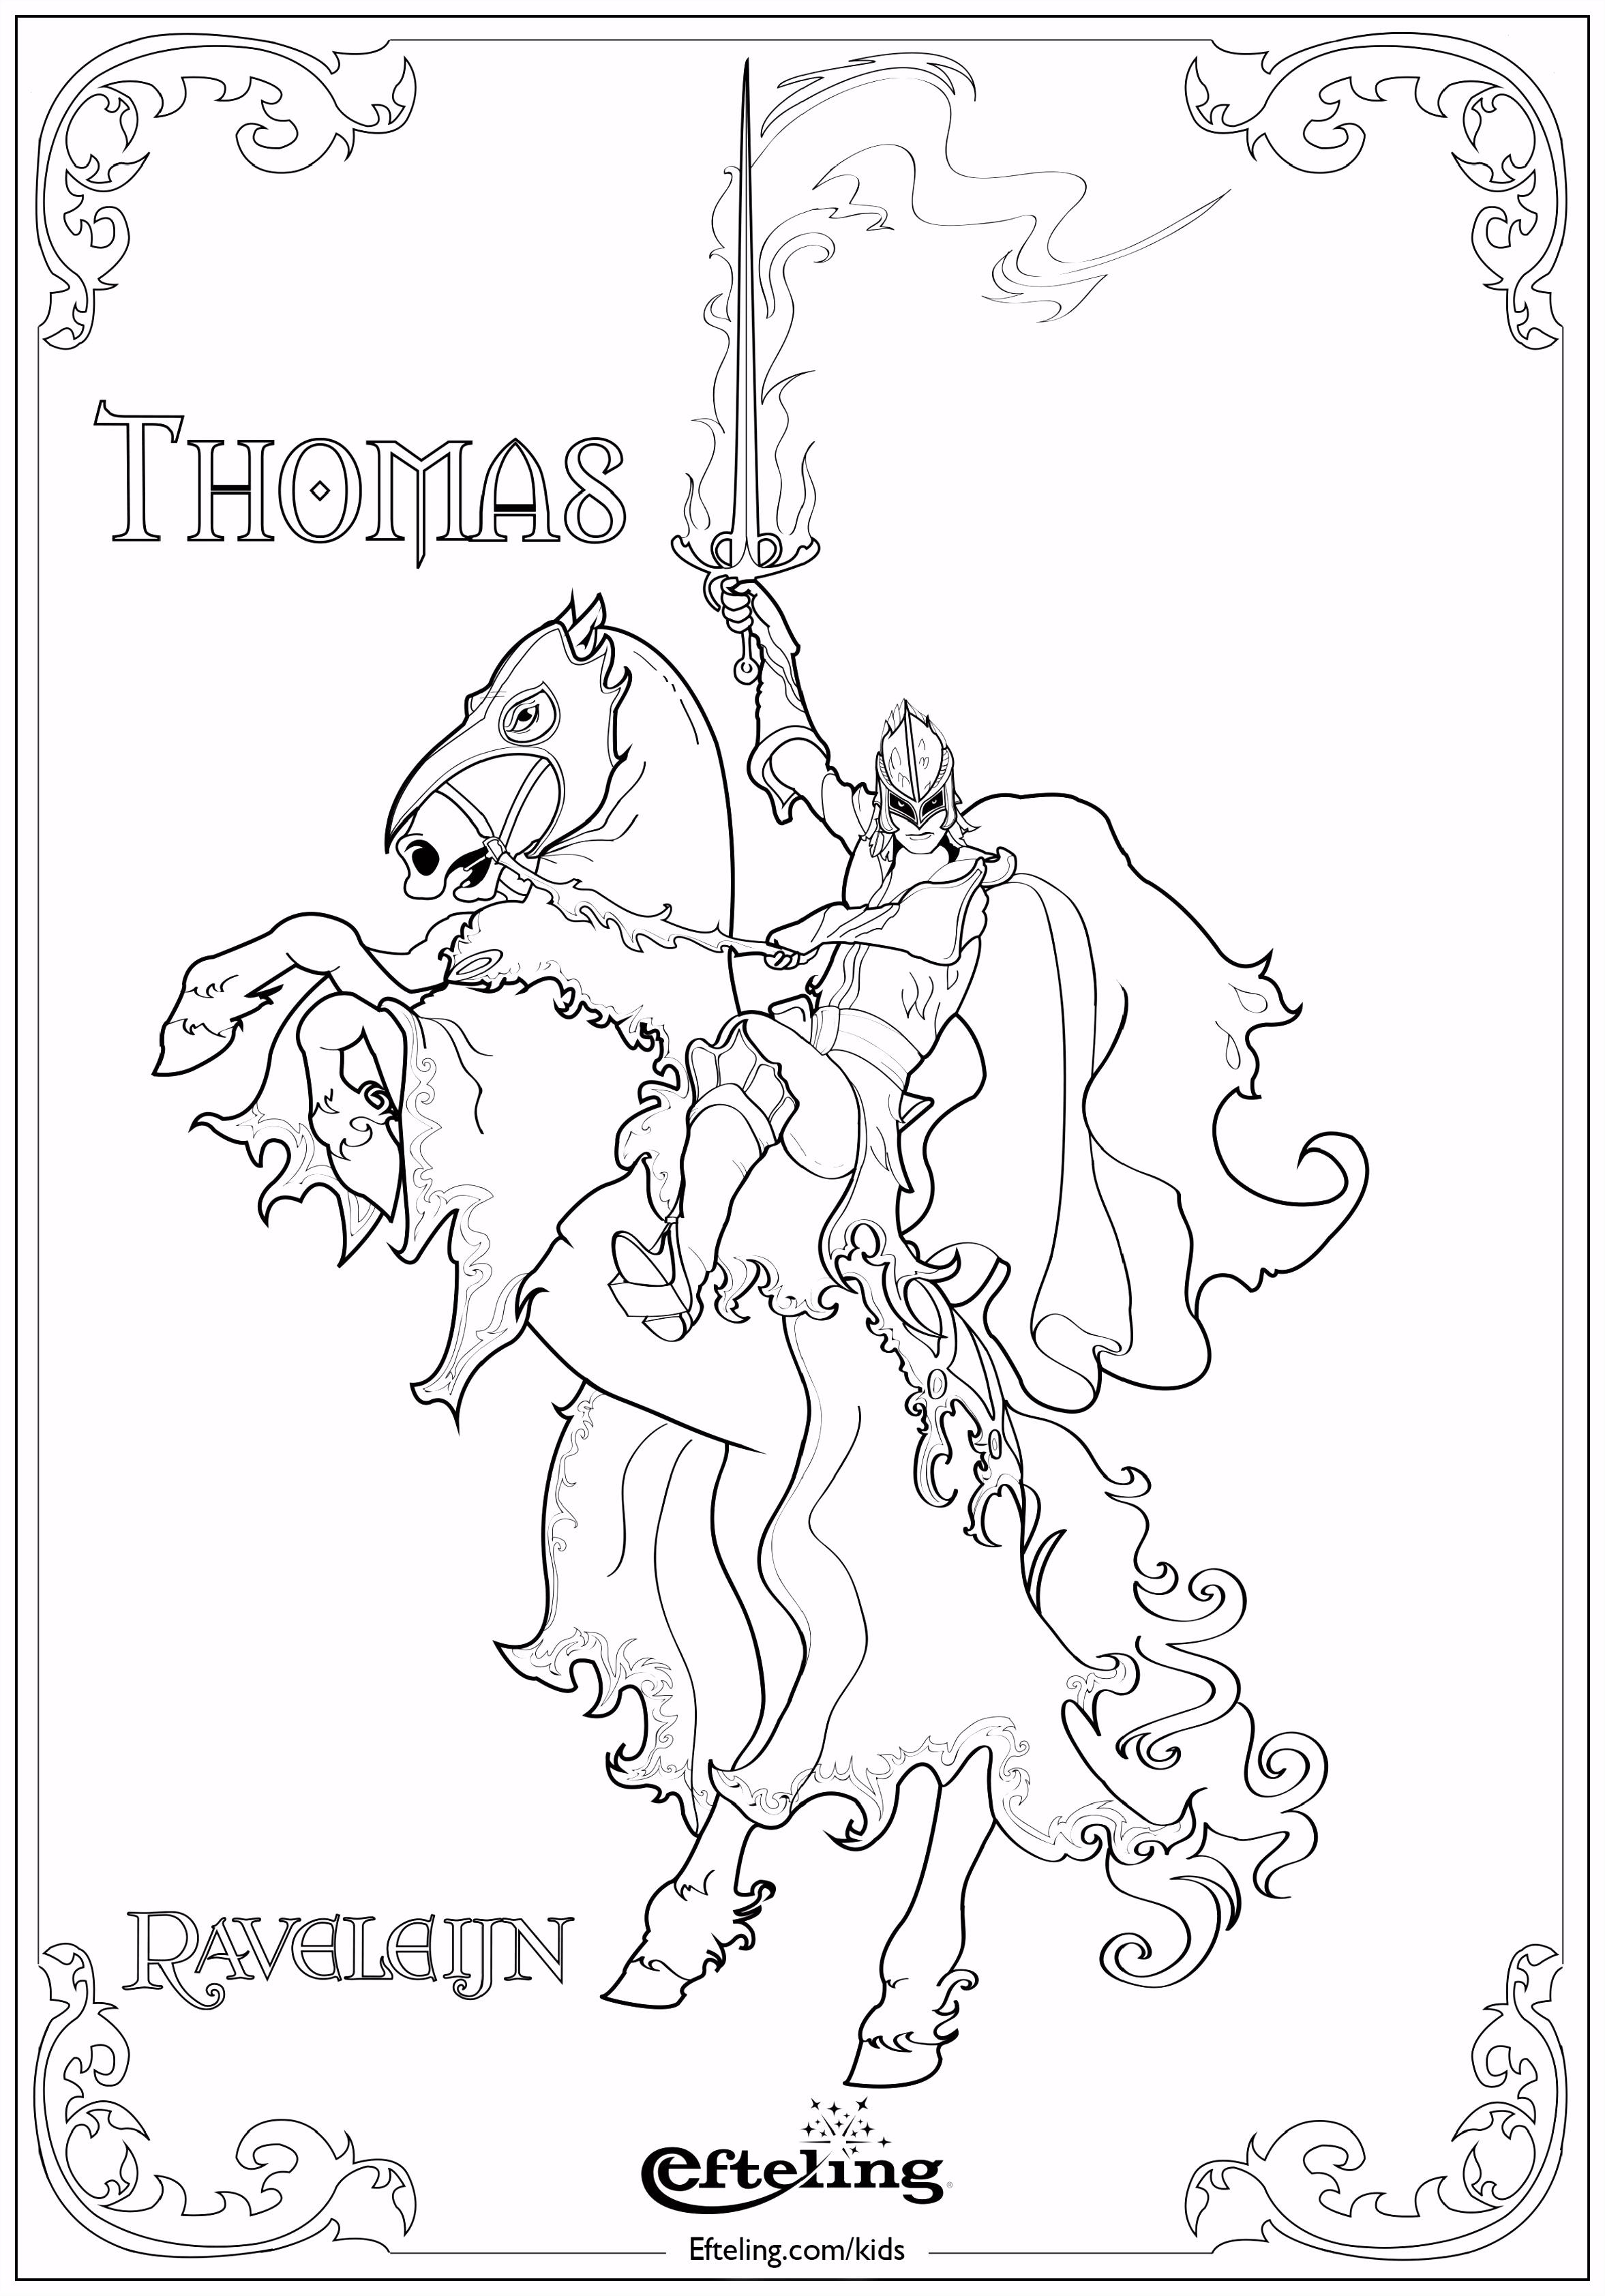 Kies Een Kleurplaat Van Jokie Thomas Van Raveleijn Efteling Kleurplaat R8bb01kec5 Tumx60ekdh